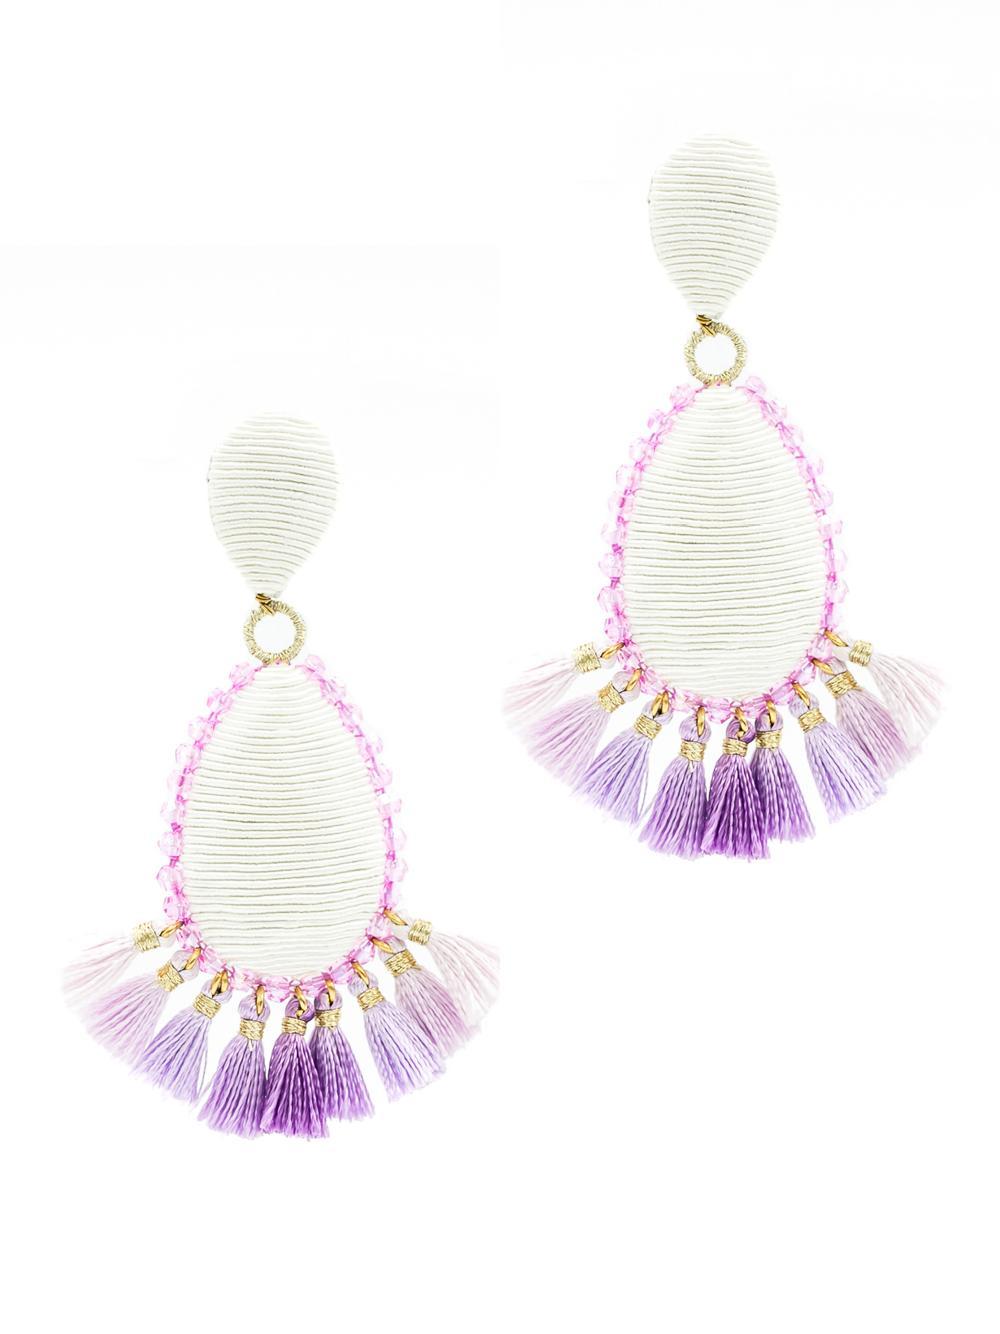 Exuma Tassel Earrings Item # 354LDEL